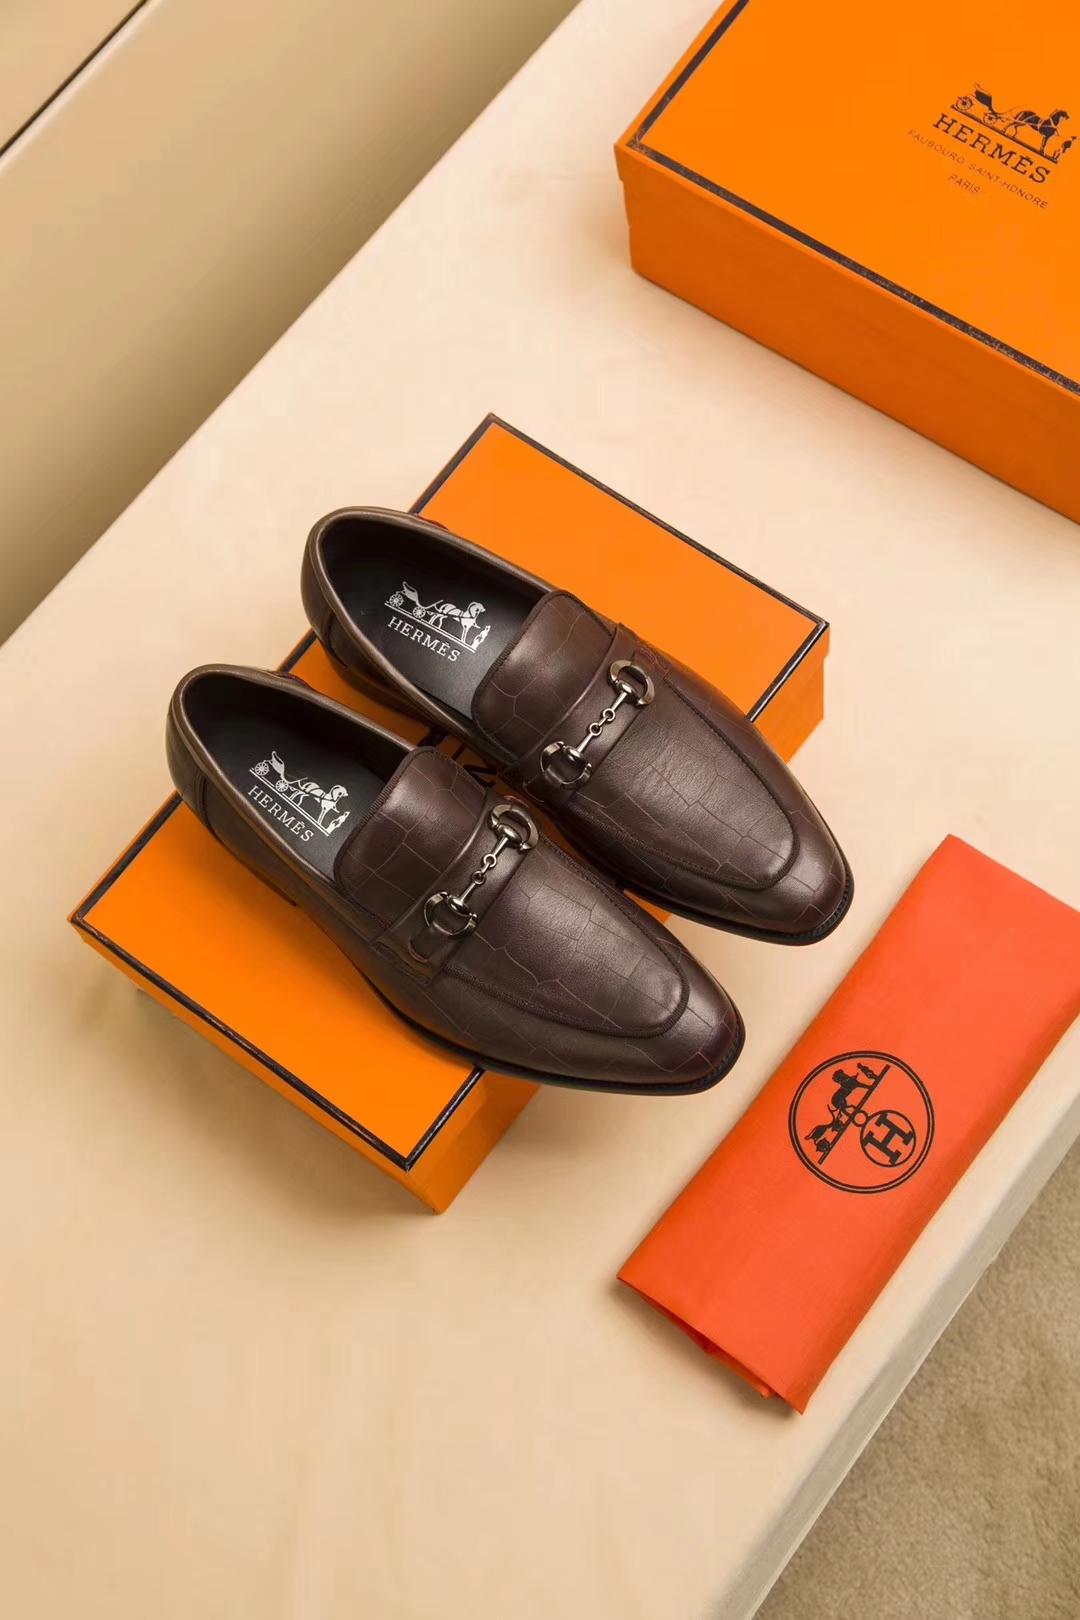 LoulsVultton皮鞋 代购级别LV男士皮鞋专柜同步发售